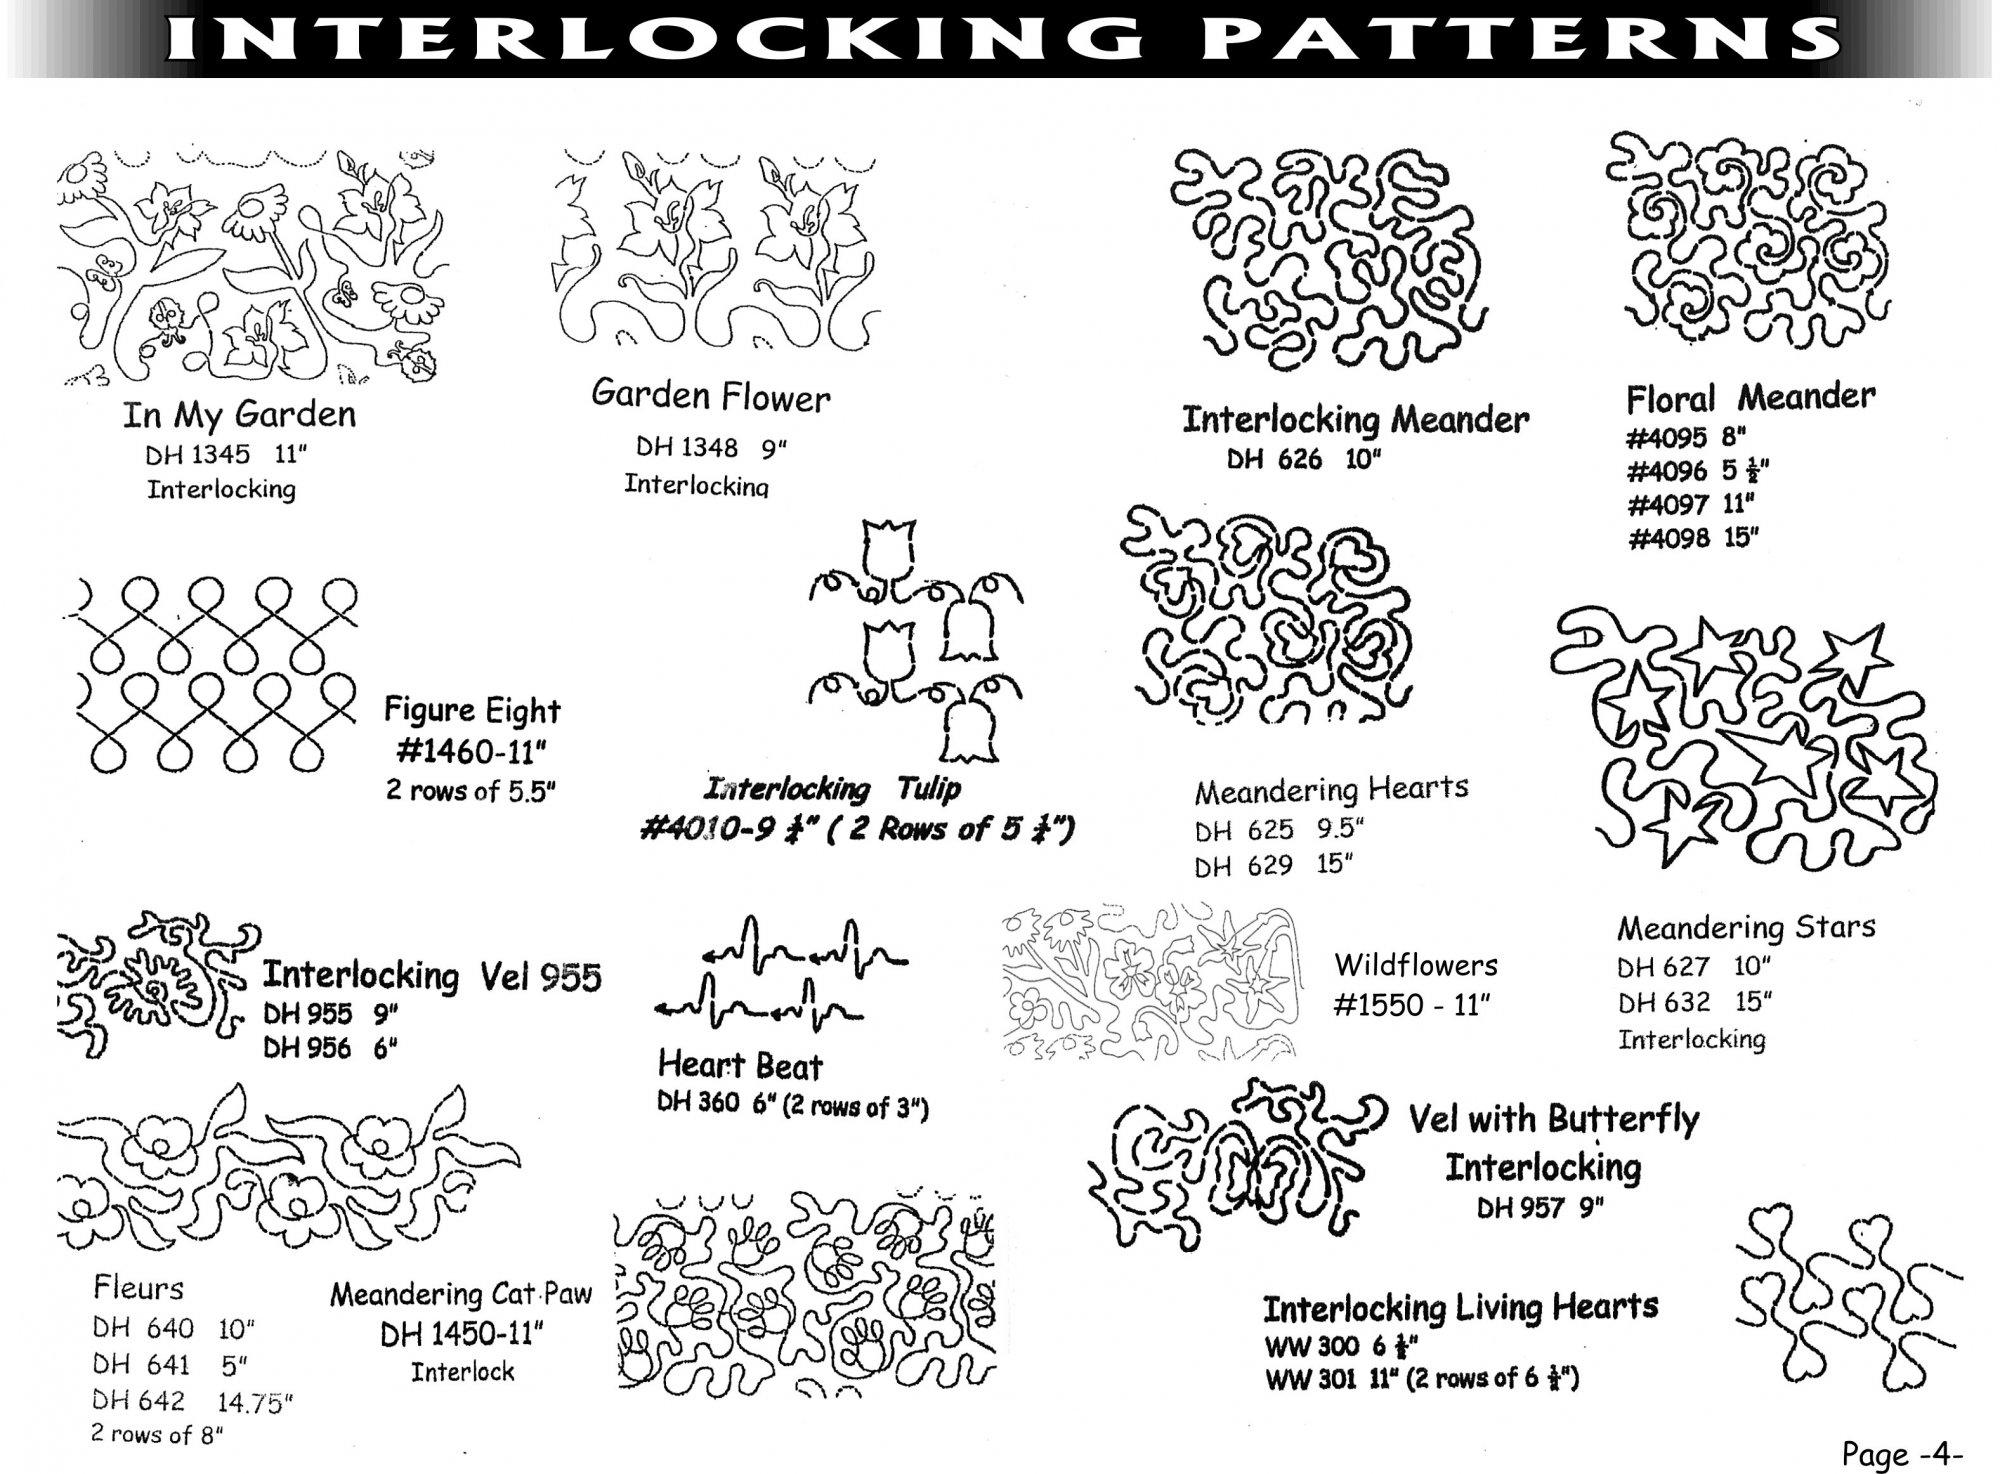 Pantographs-Interlocking Patterns-A- 2  - 6